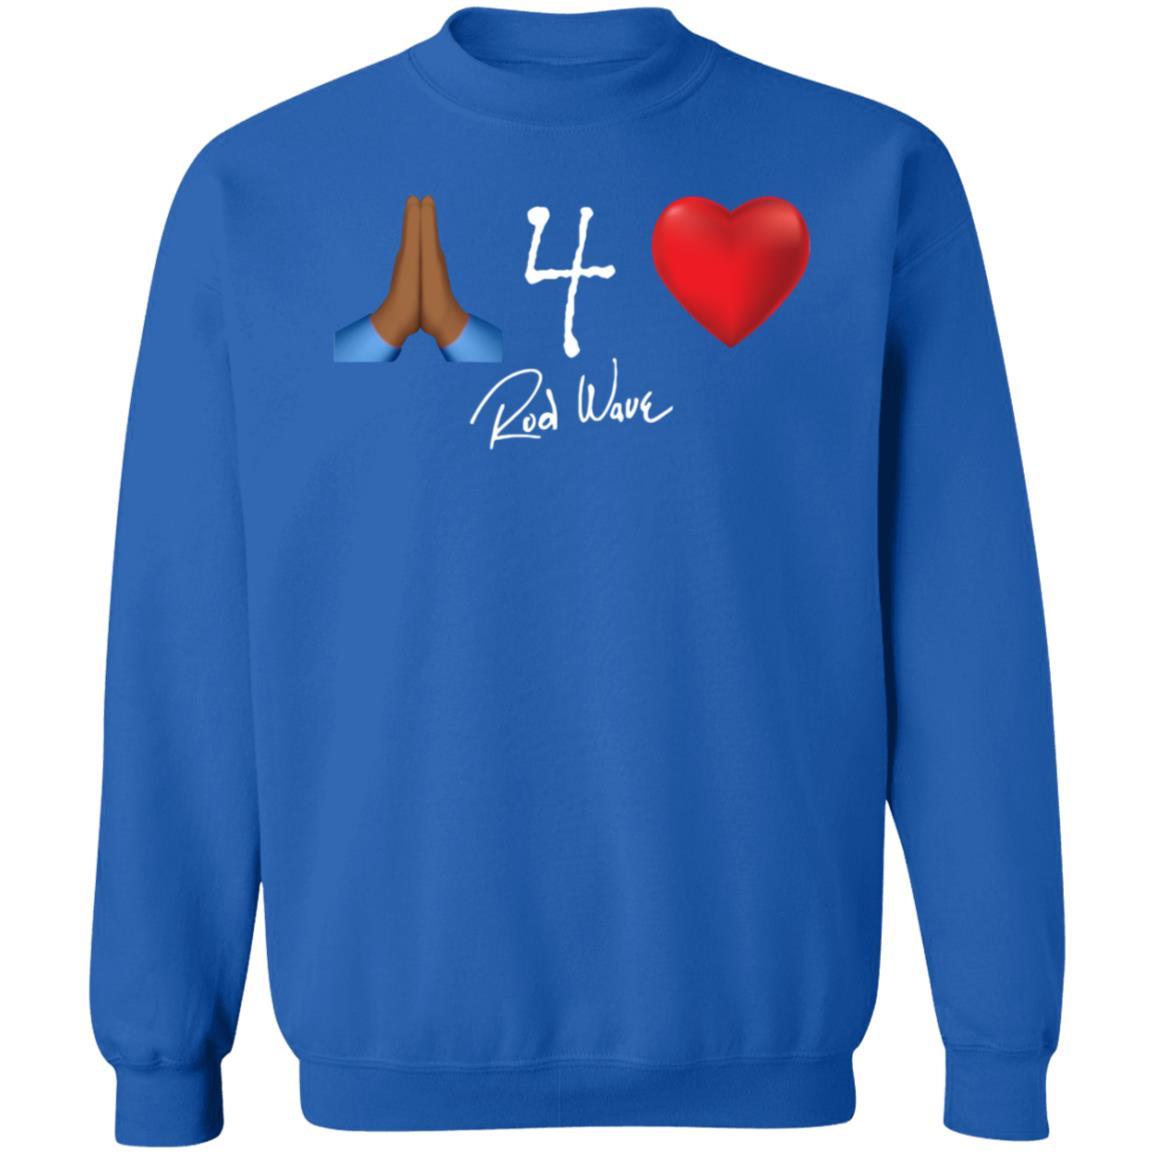 Rod Wave Merch Pray 4 Love Hoodie